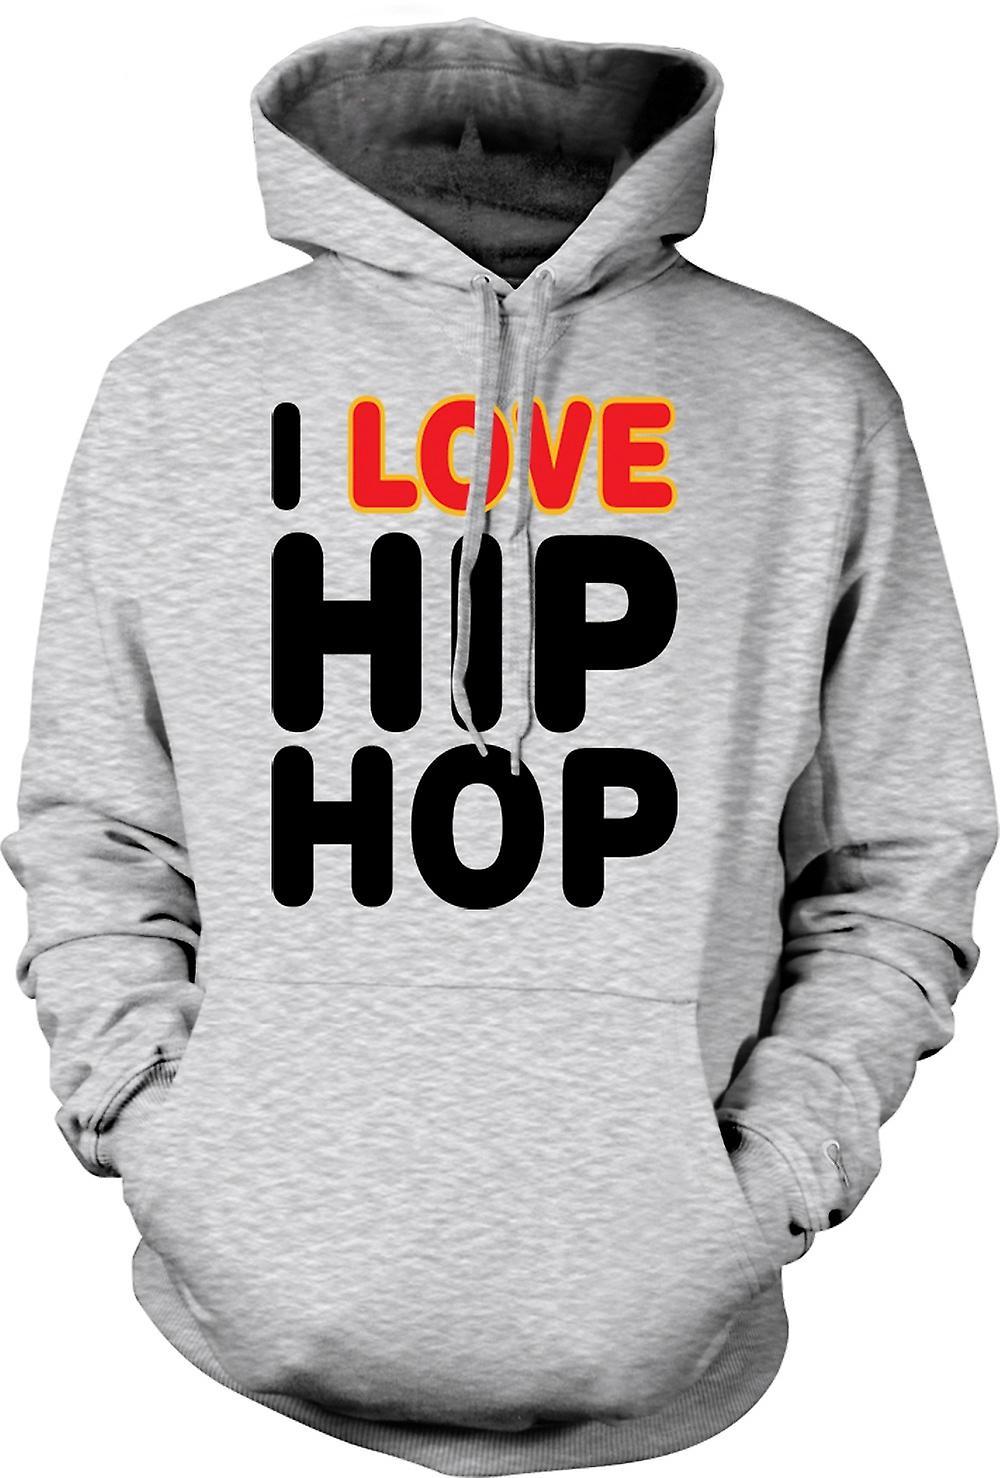 Mens Hoodie - I Love Hip Hop - Funny